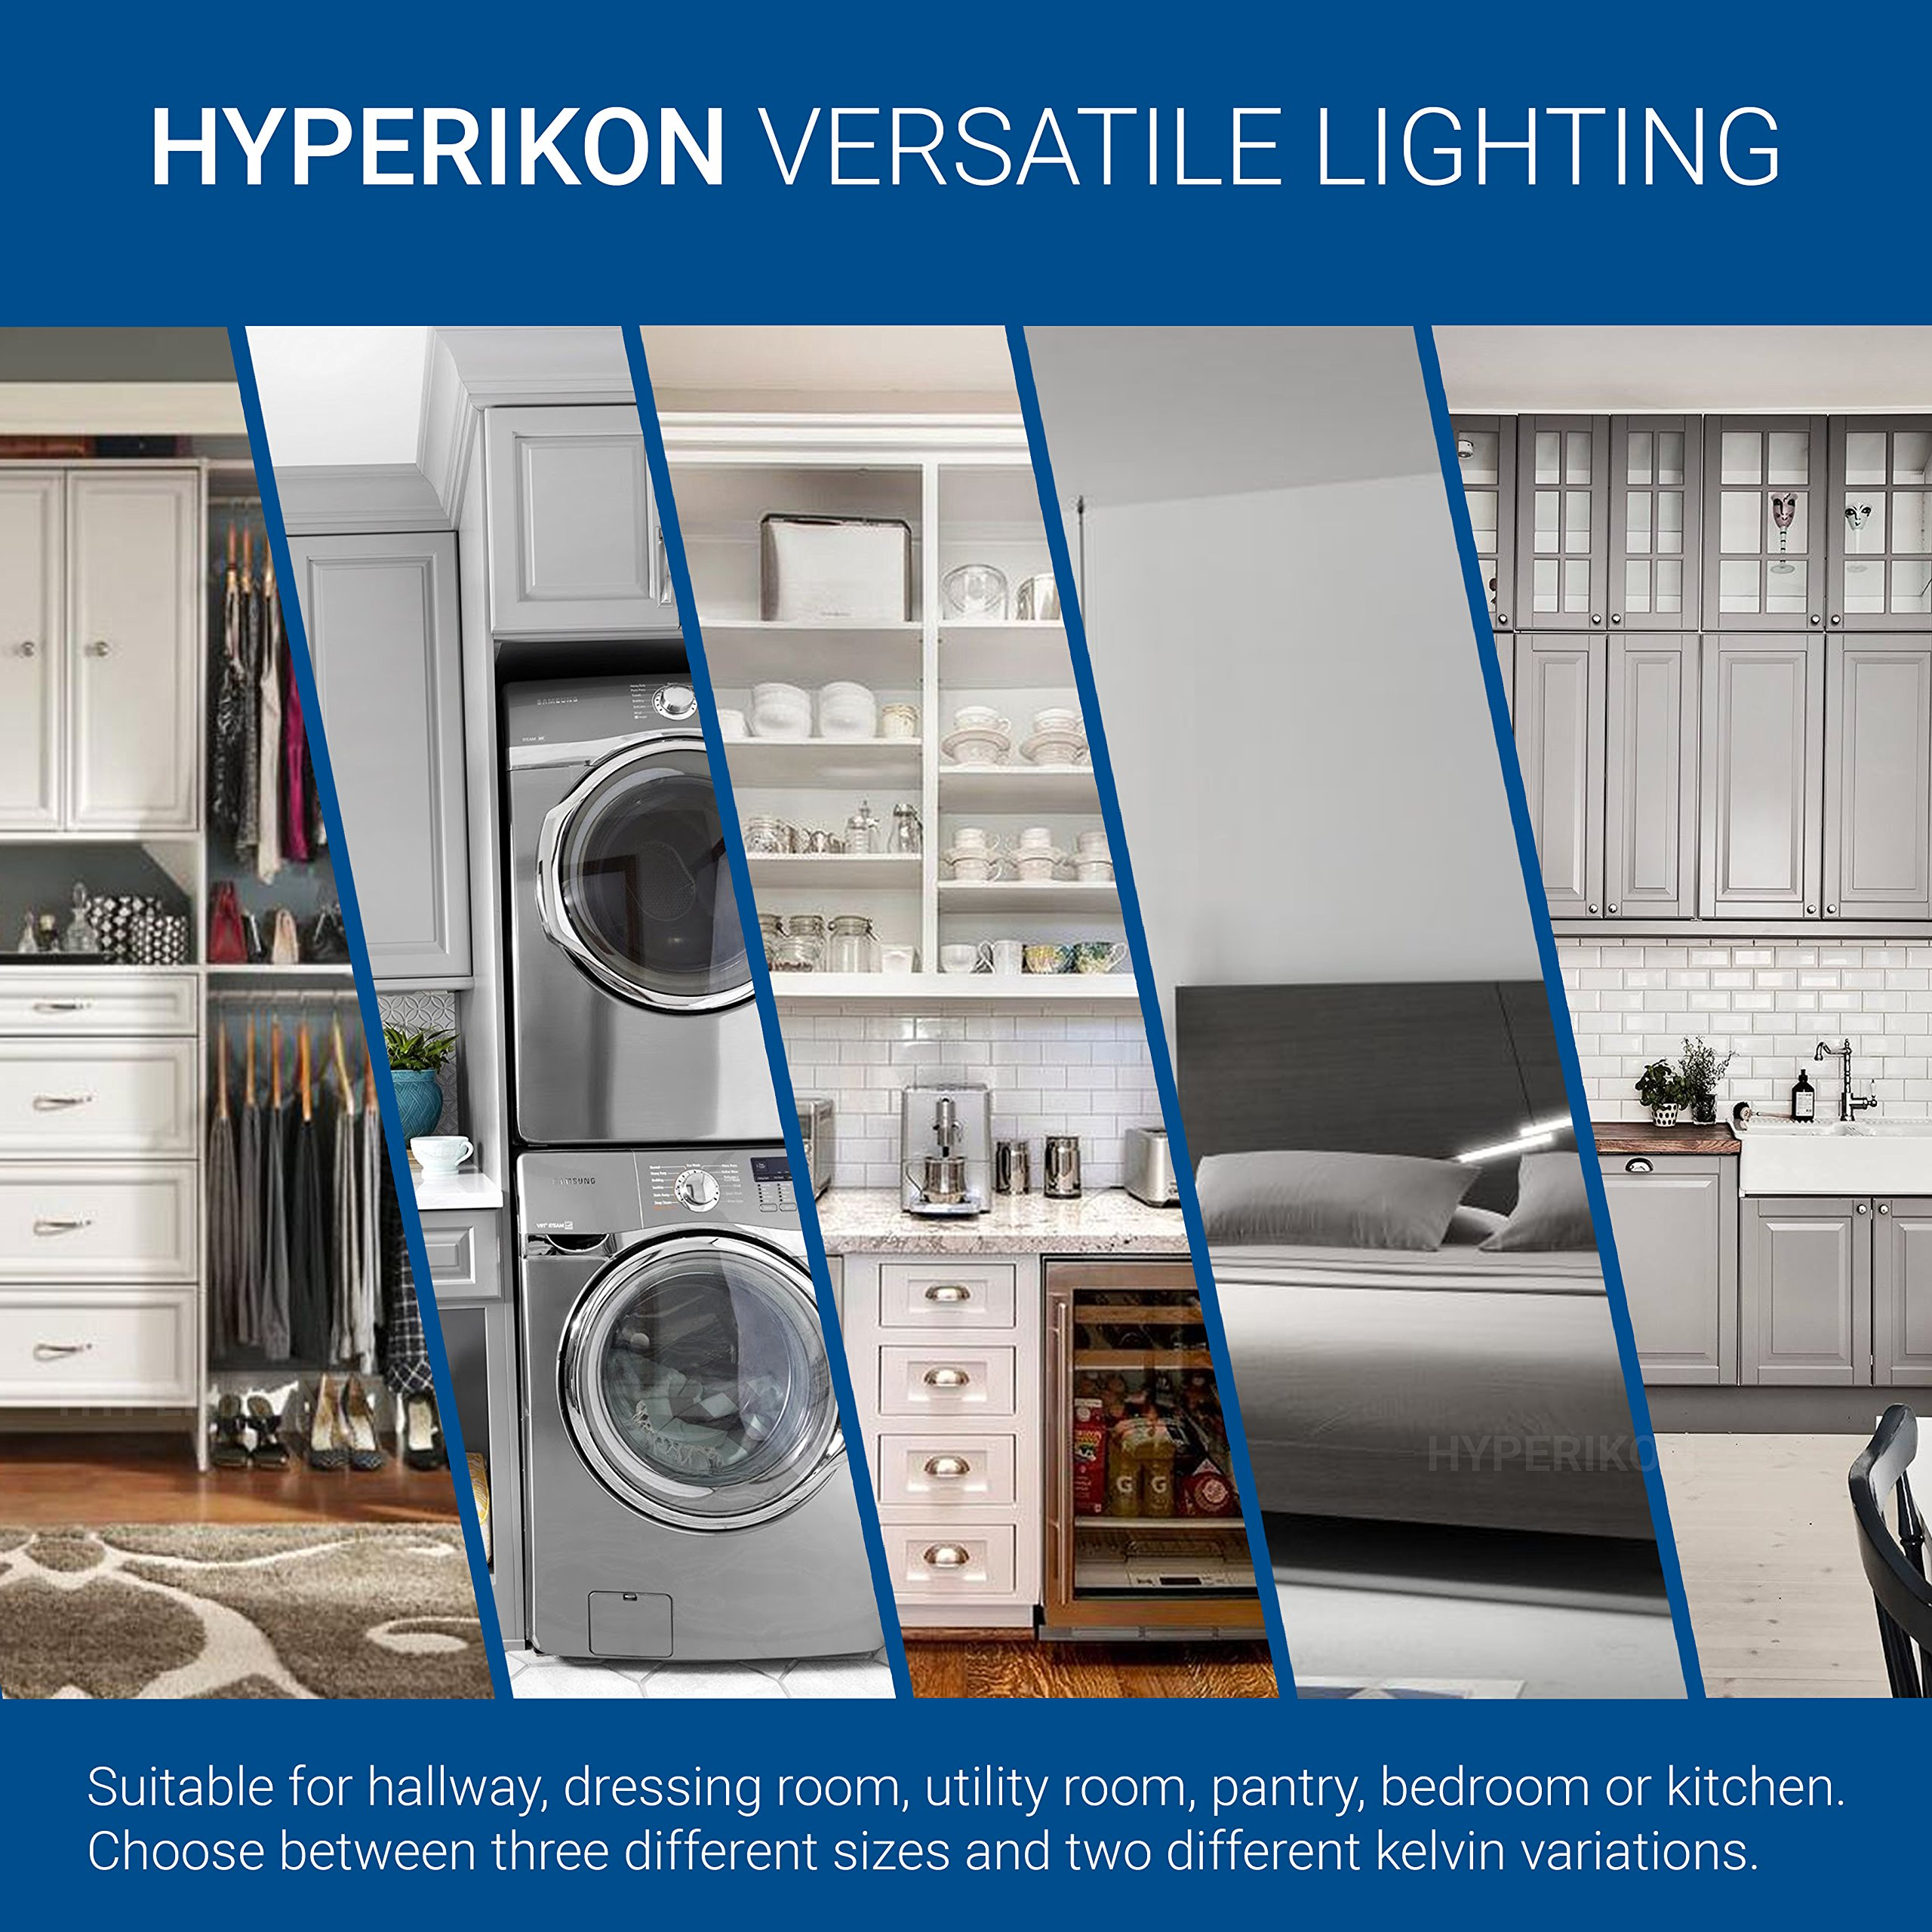 Hyperikon LED Flush Mount Ceiling Light, 14'', 100W equivalent, 1980lm, 4000K (Daylight Glow), 120V, 14-Inch, Dimmable by Hyperikon (Image #10)